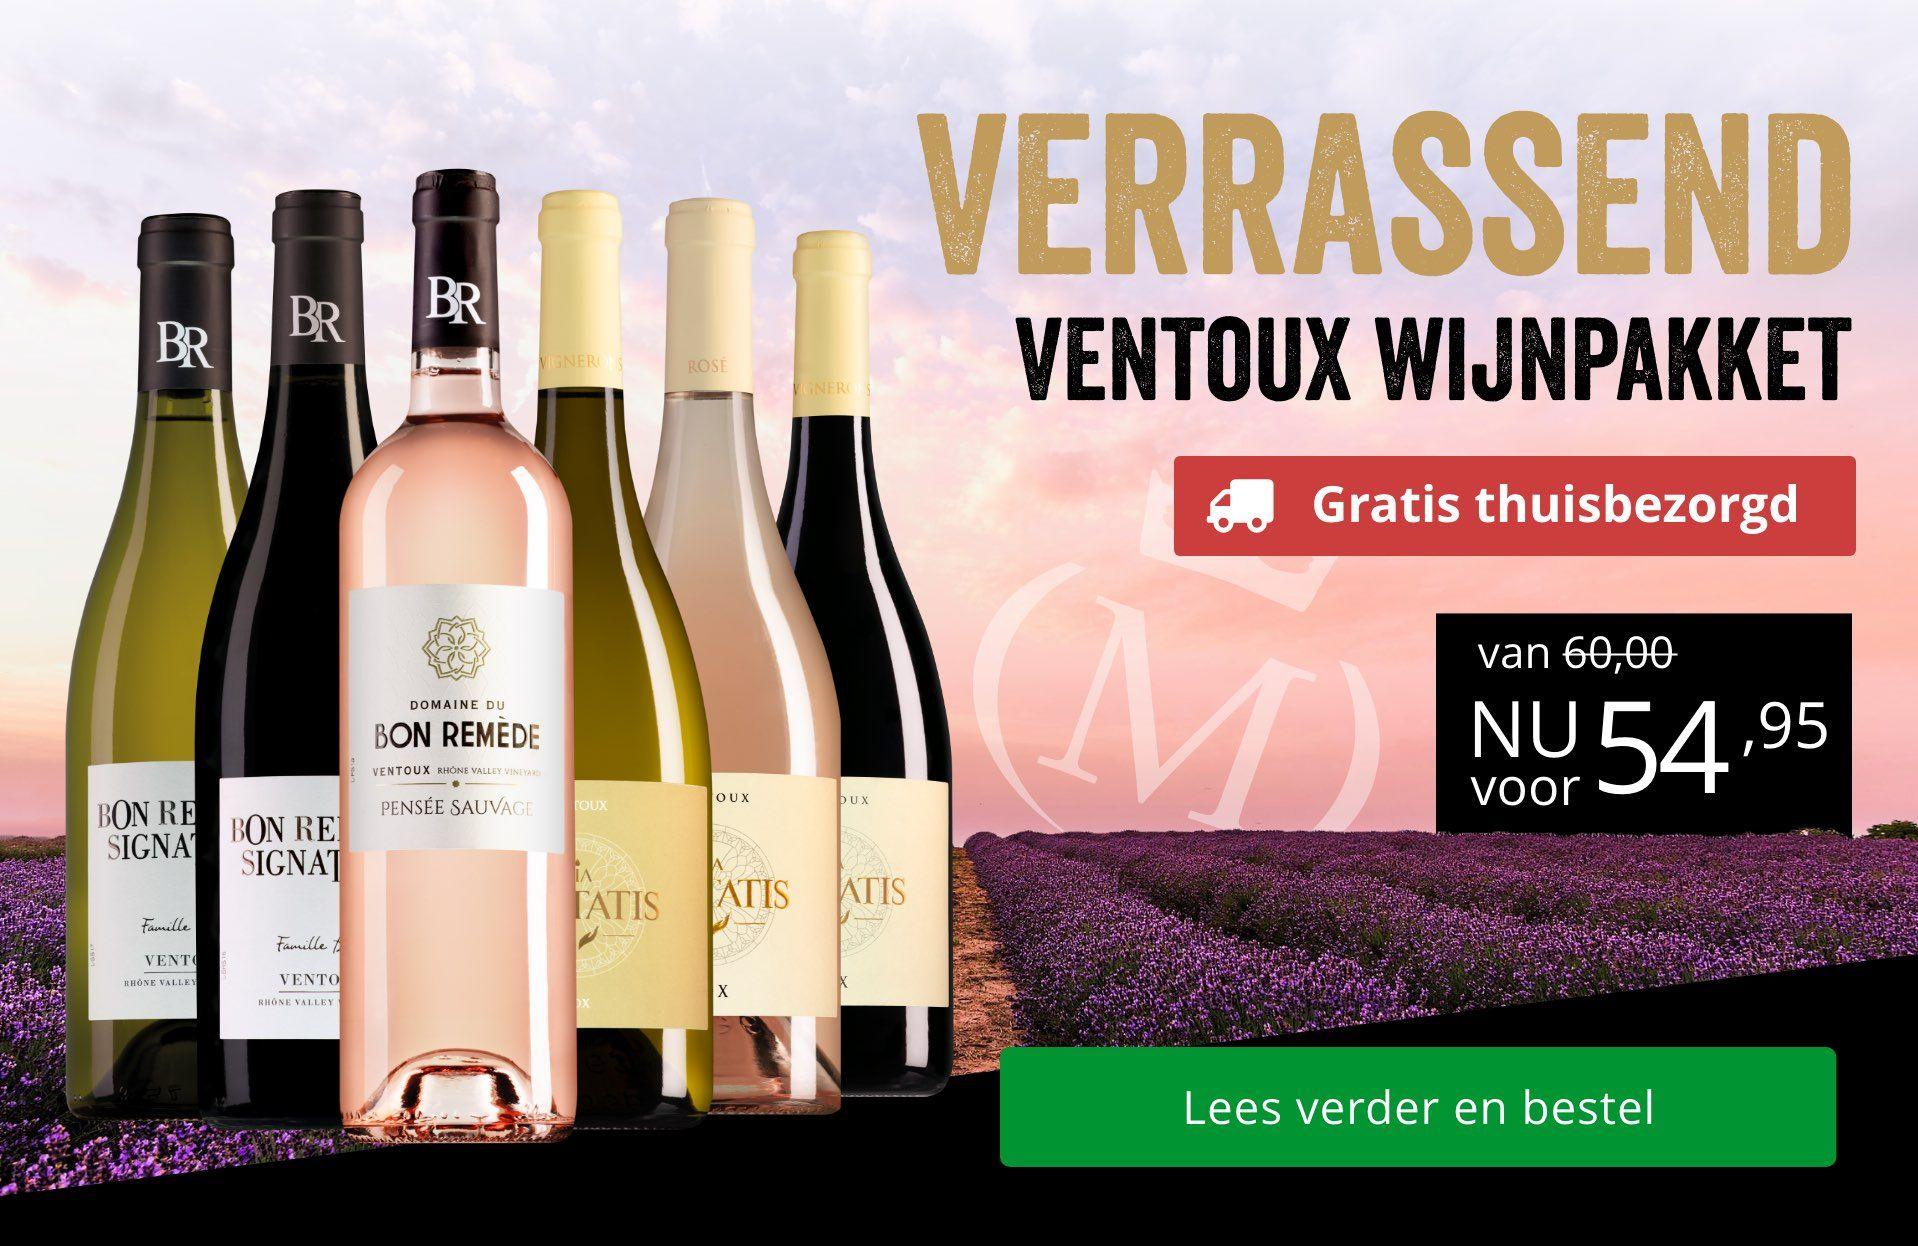 Verrassend Ventoux Wijnpakket